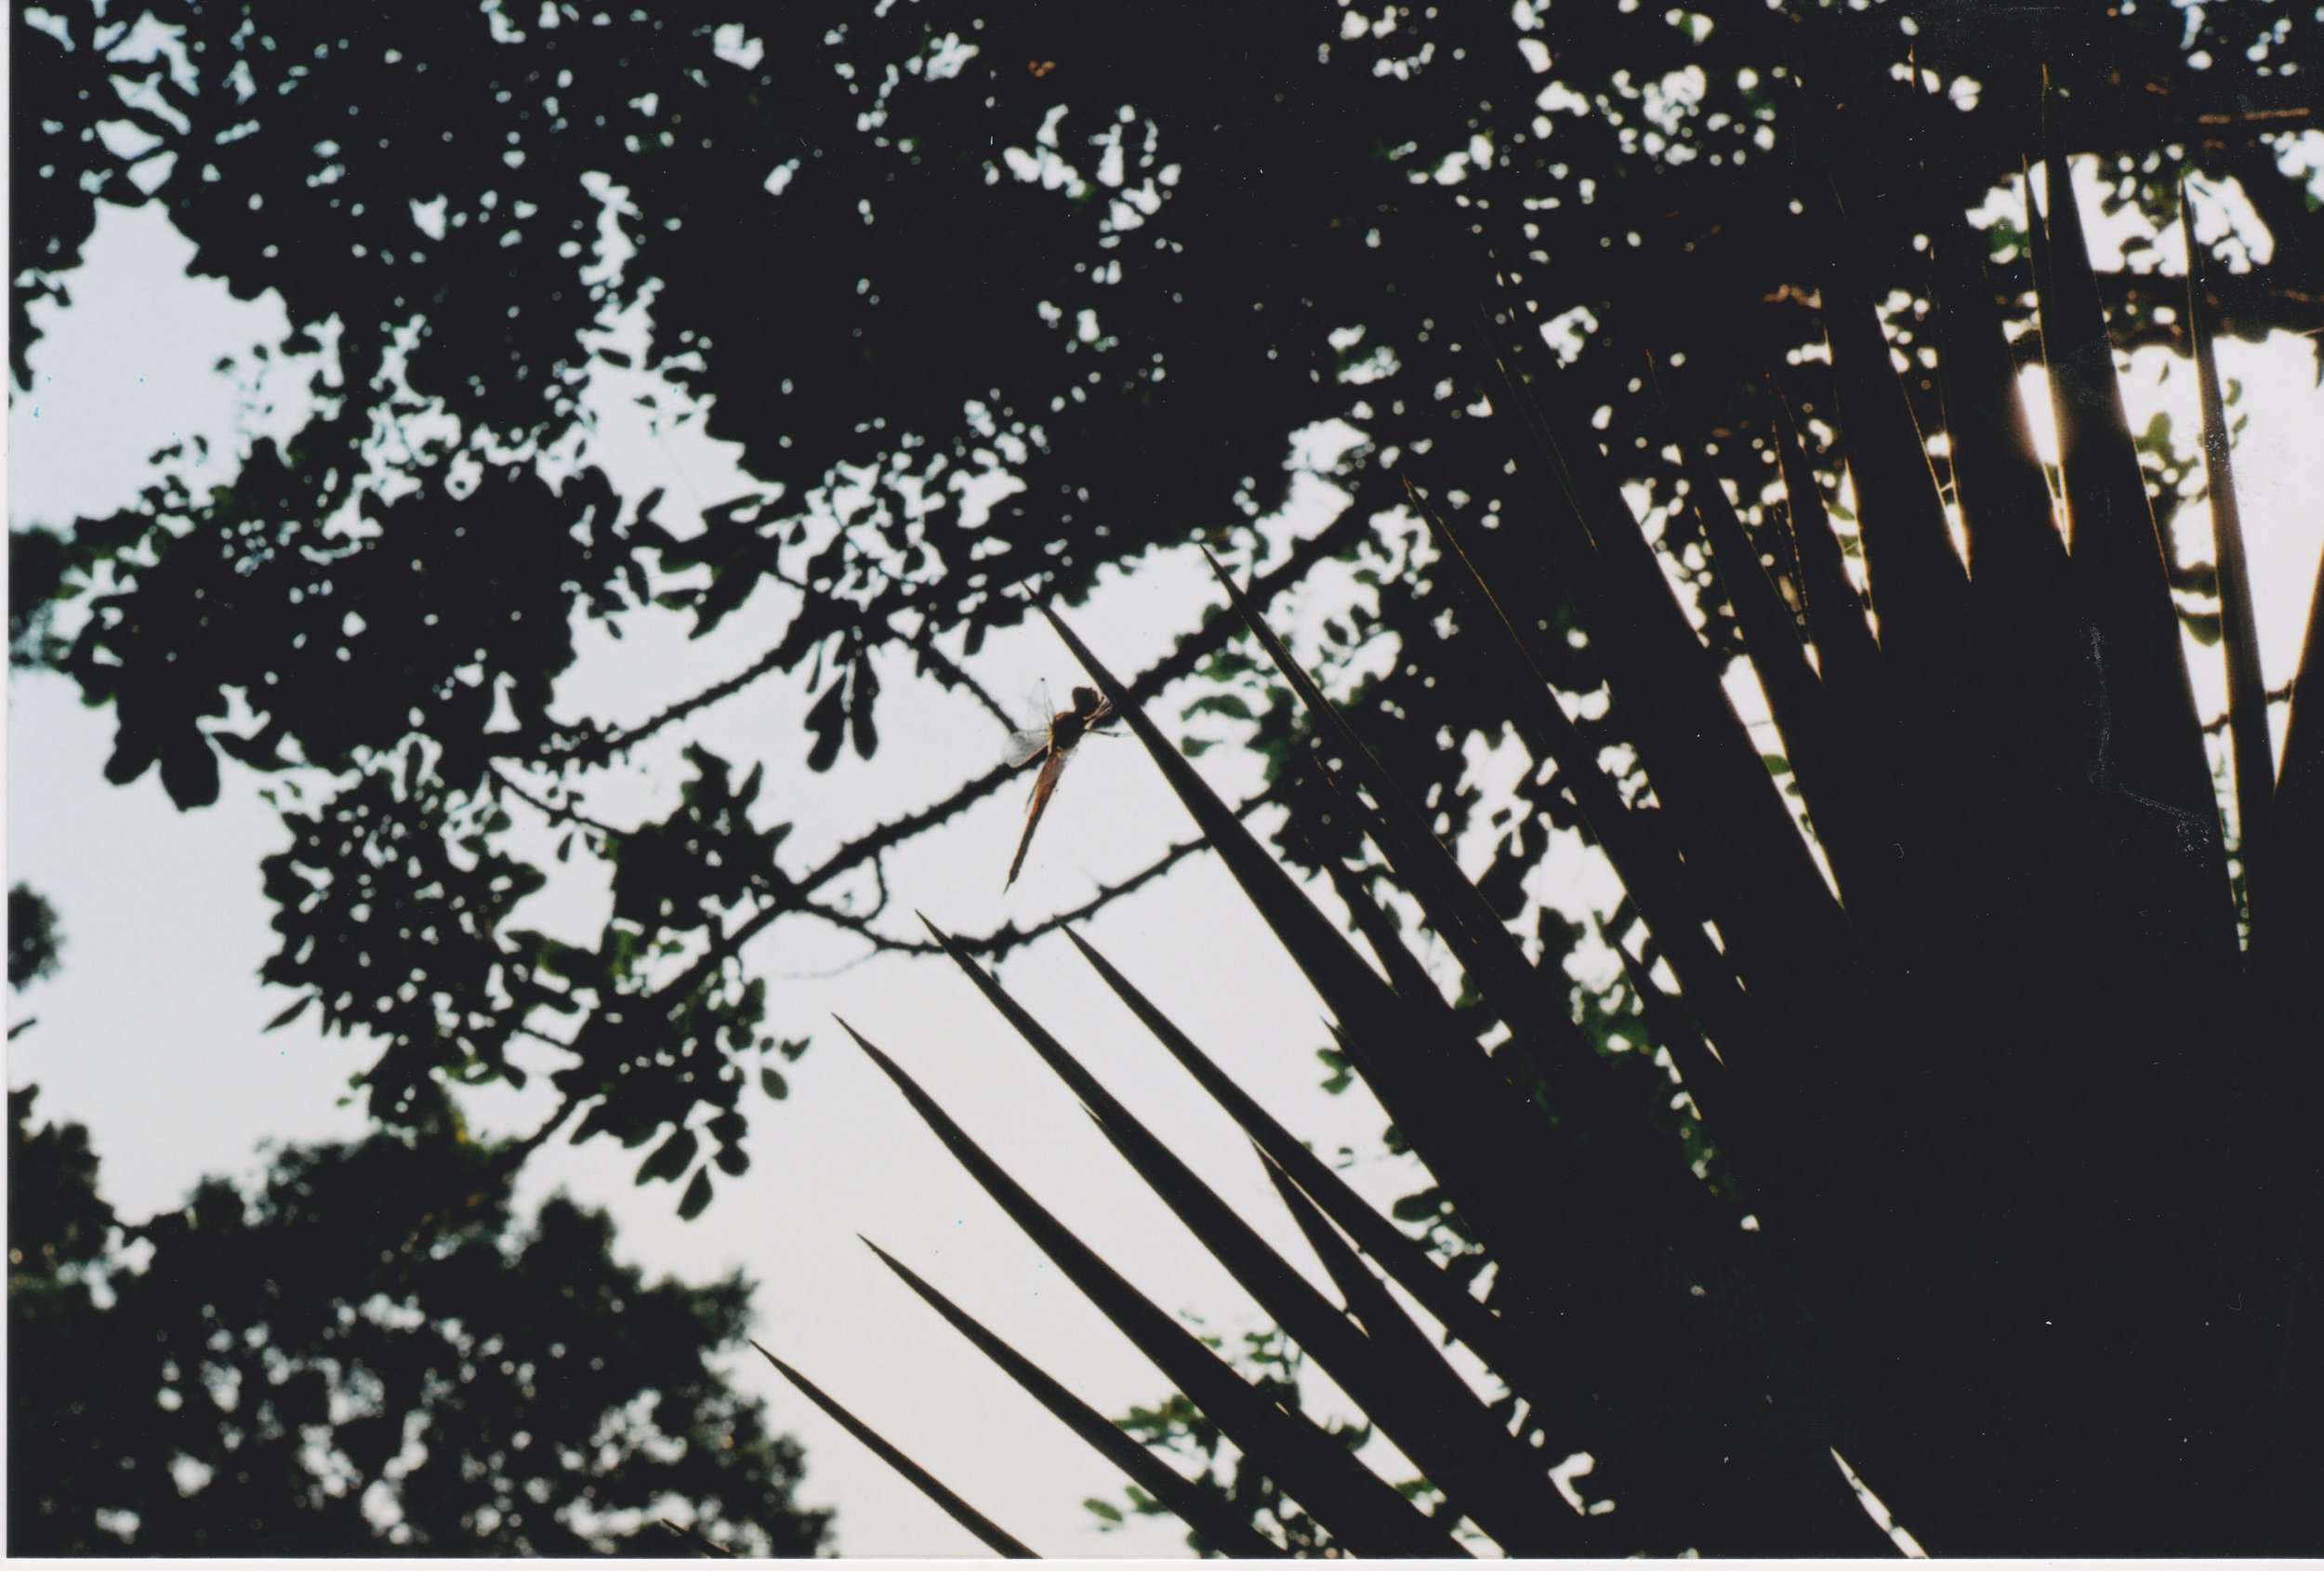 Soph Bonde/Argot Publications    [Image Description: A silhouette of a dragonfly hovers against a large spikey plant]